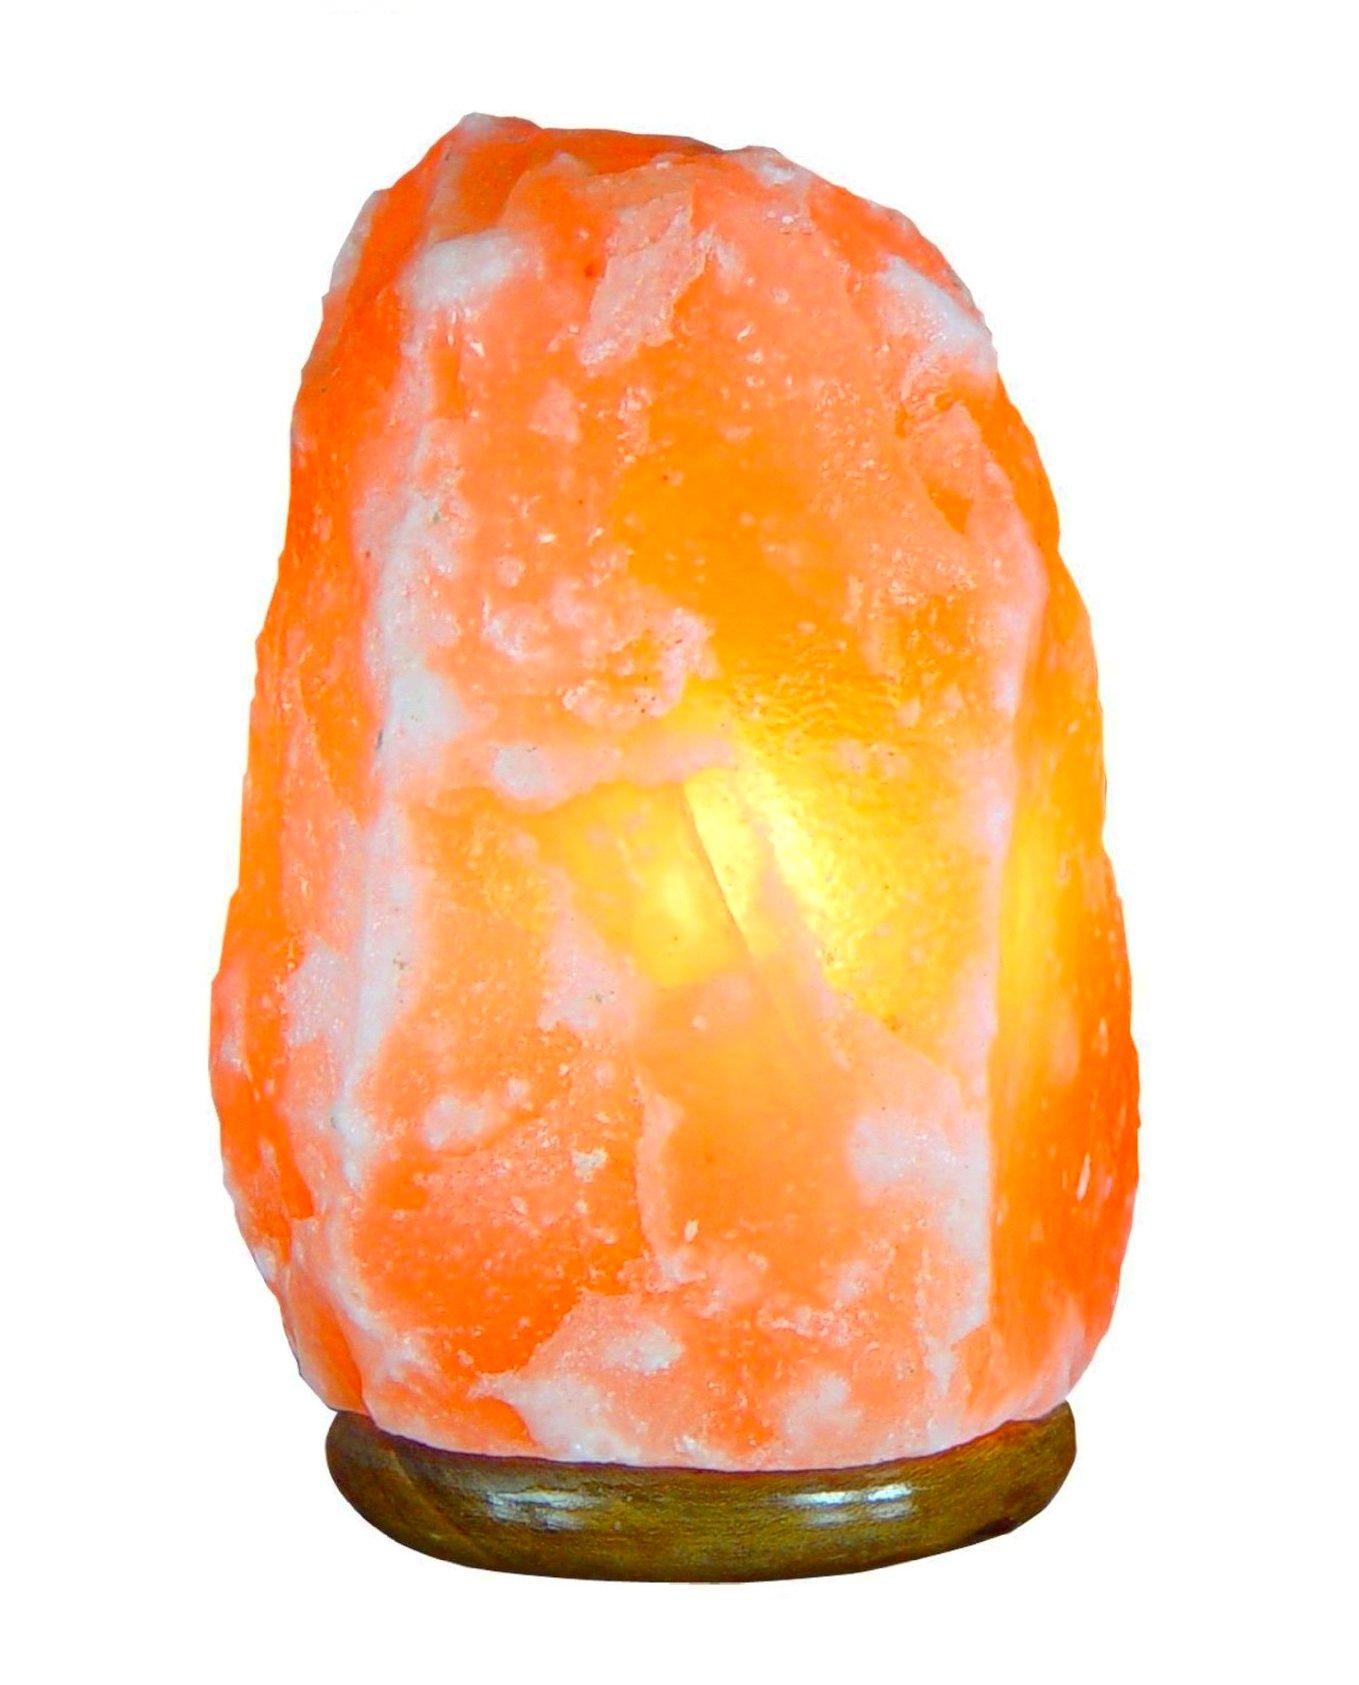 Bel Air Naturals Himalayan Salt Lamp - Hand Carved Natural Pink Hymilian Salt Rock Crystal Hymalain Salt Lamps - Premium Quality Genuine Wood Base - UL Listed Brightness (Himalayan Salt Lamp 7-9)